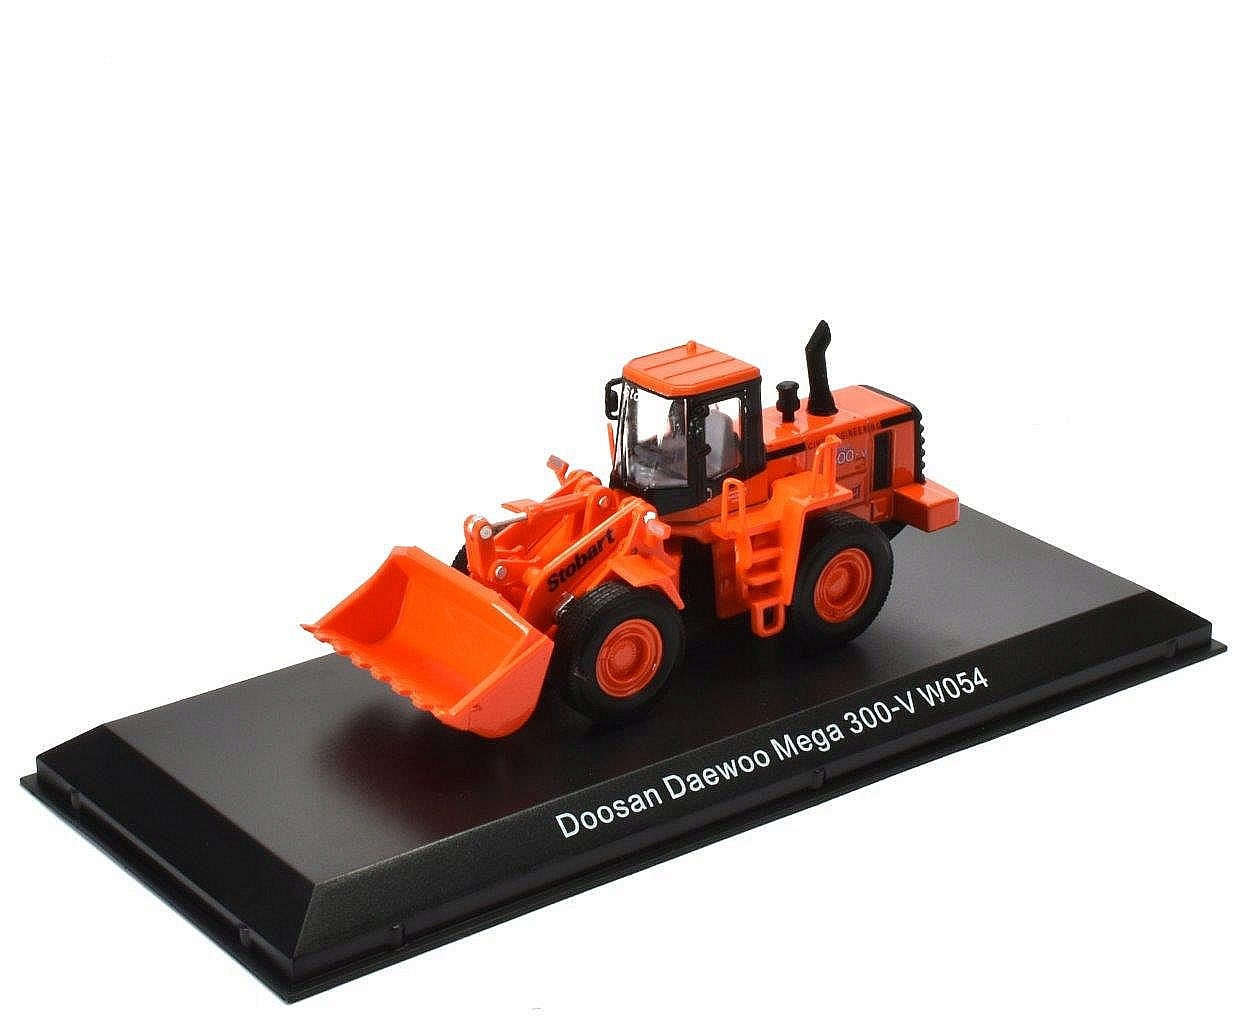 Ładowarka Doosan Daewoo Mega 300-V W054 1/76 Atlas